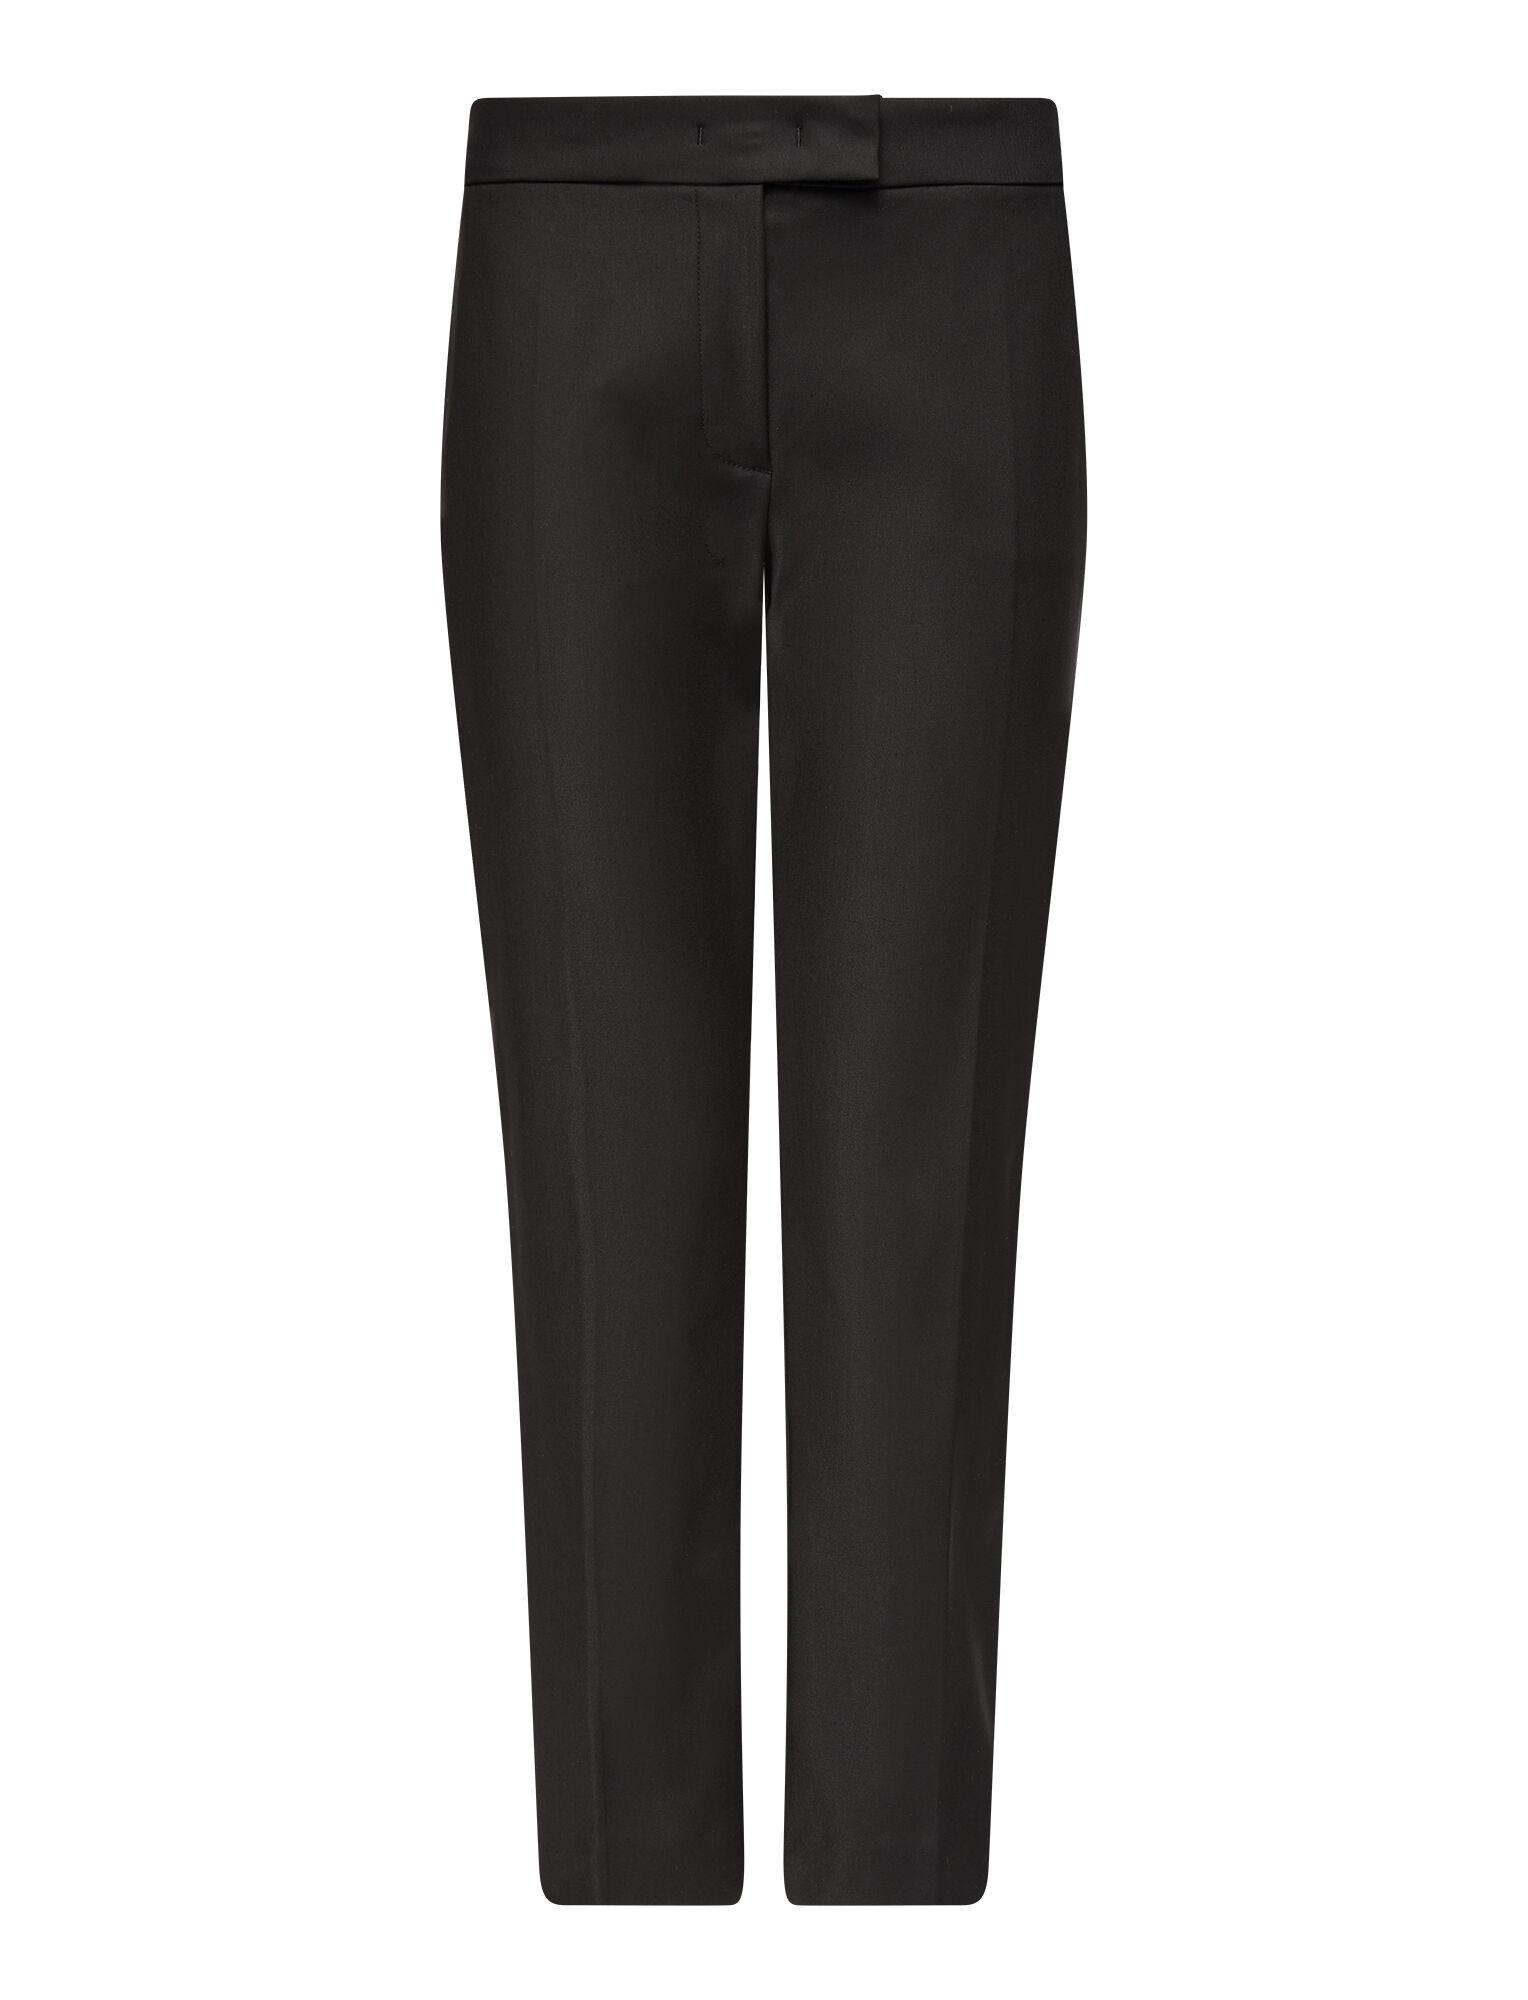 Joseph, Technical Cotton Queen Trousers, in BLACK